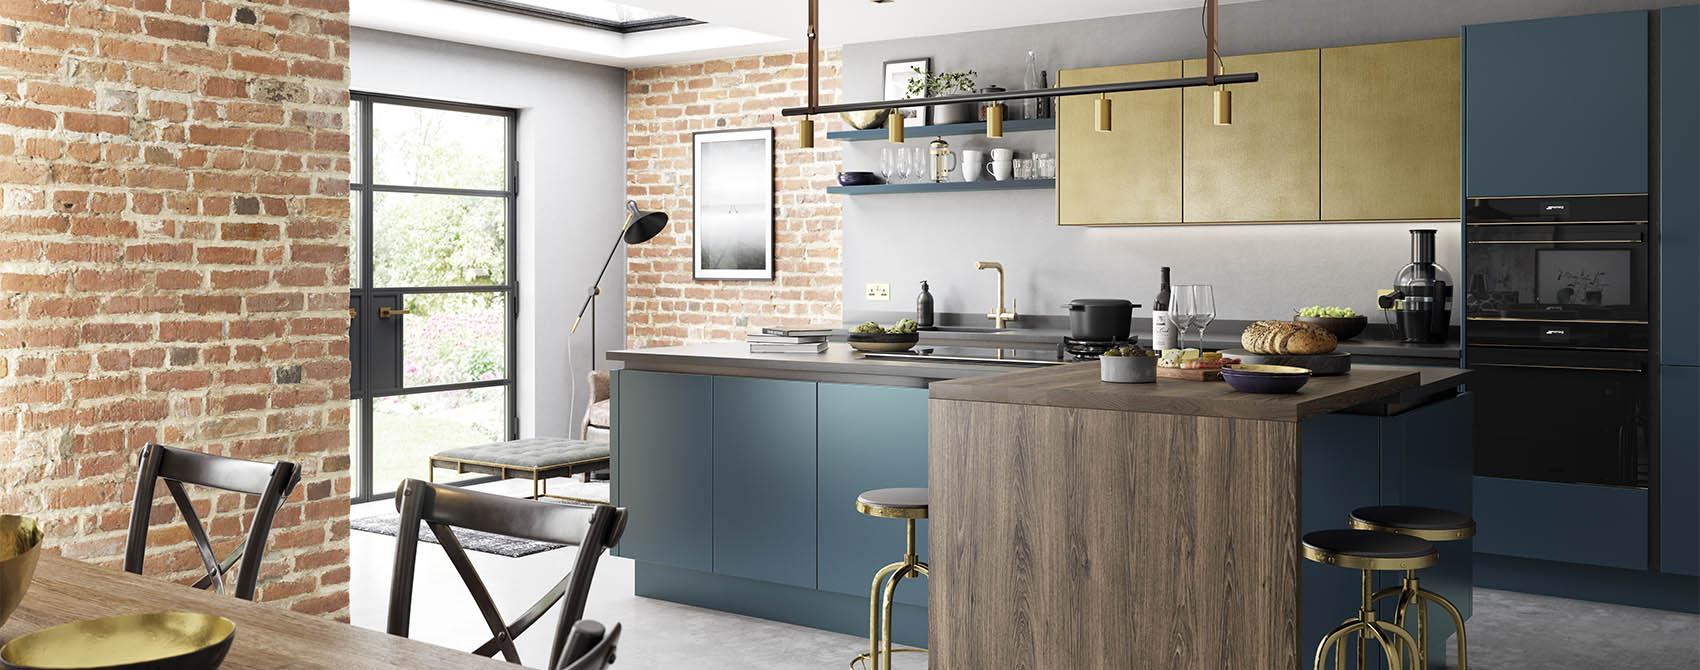 Blue handleless kitchen